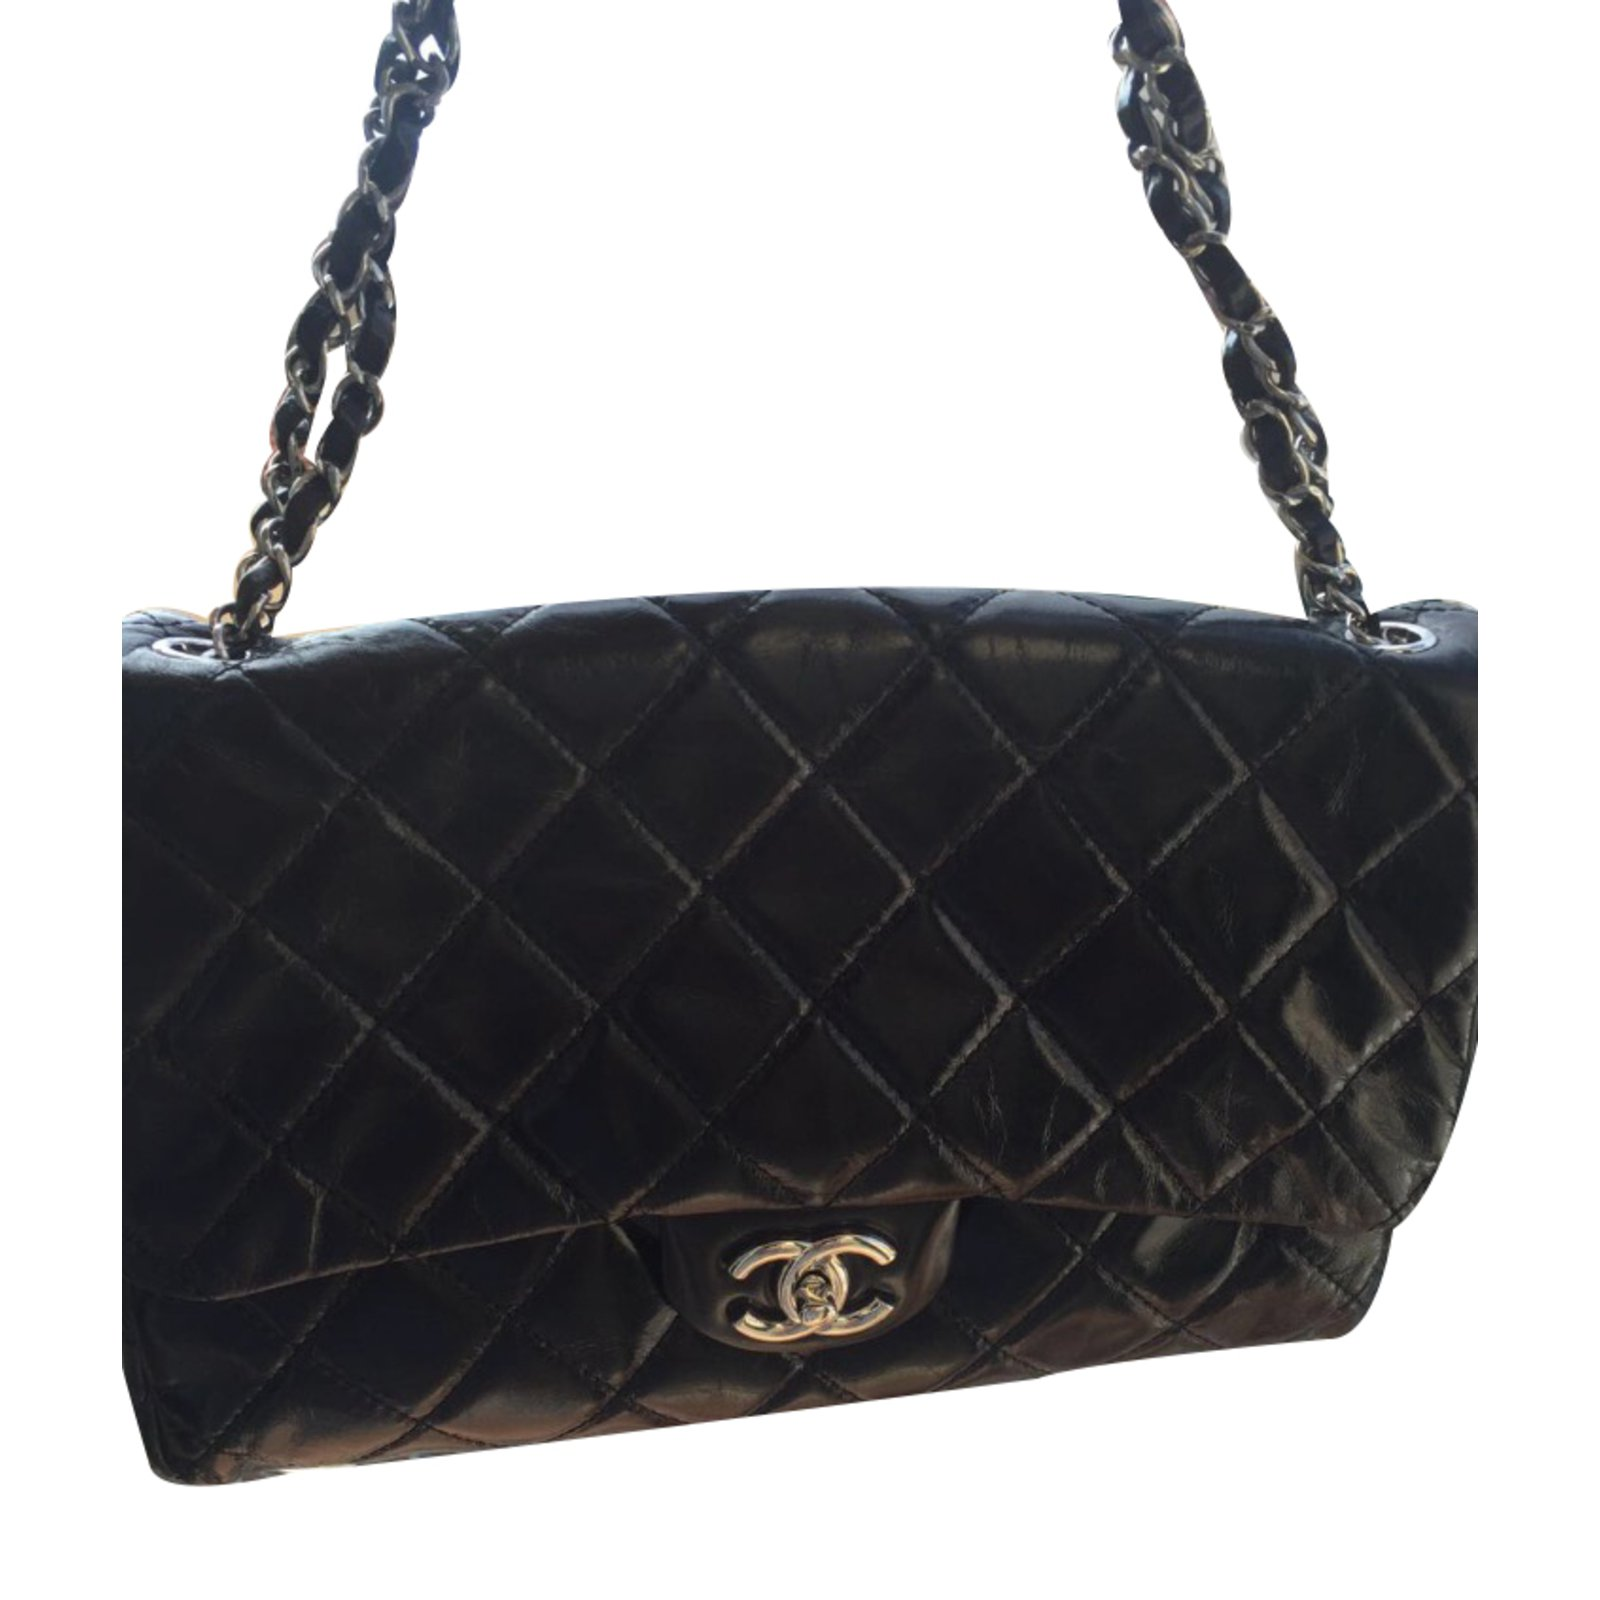 633533e2a390e9 Chanel Timeless Handbags Linen Black ref.28398 - Joli Closet